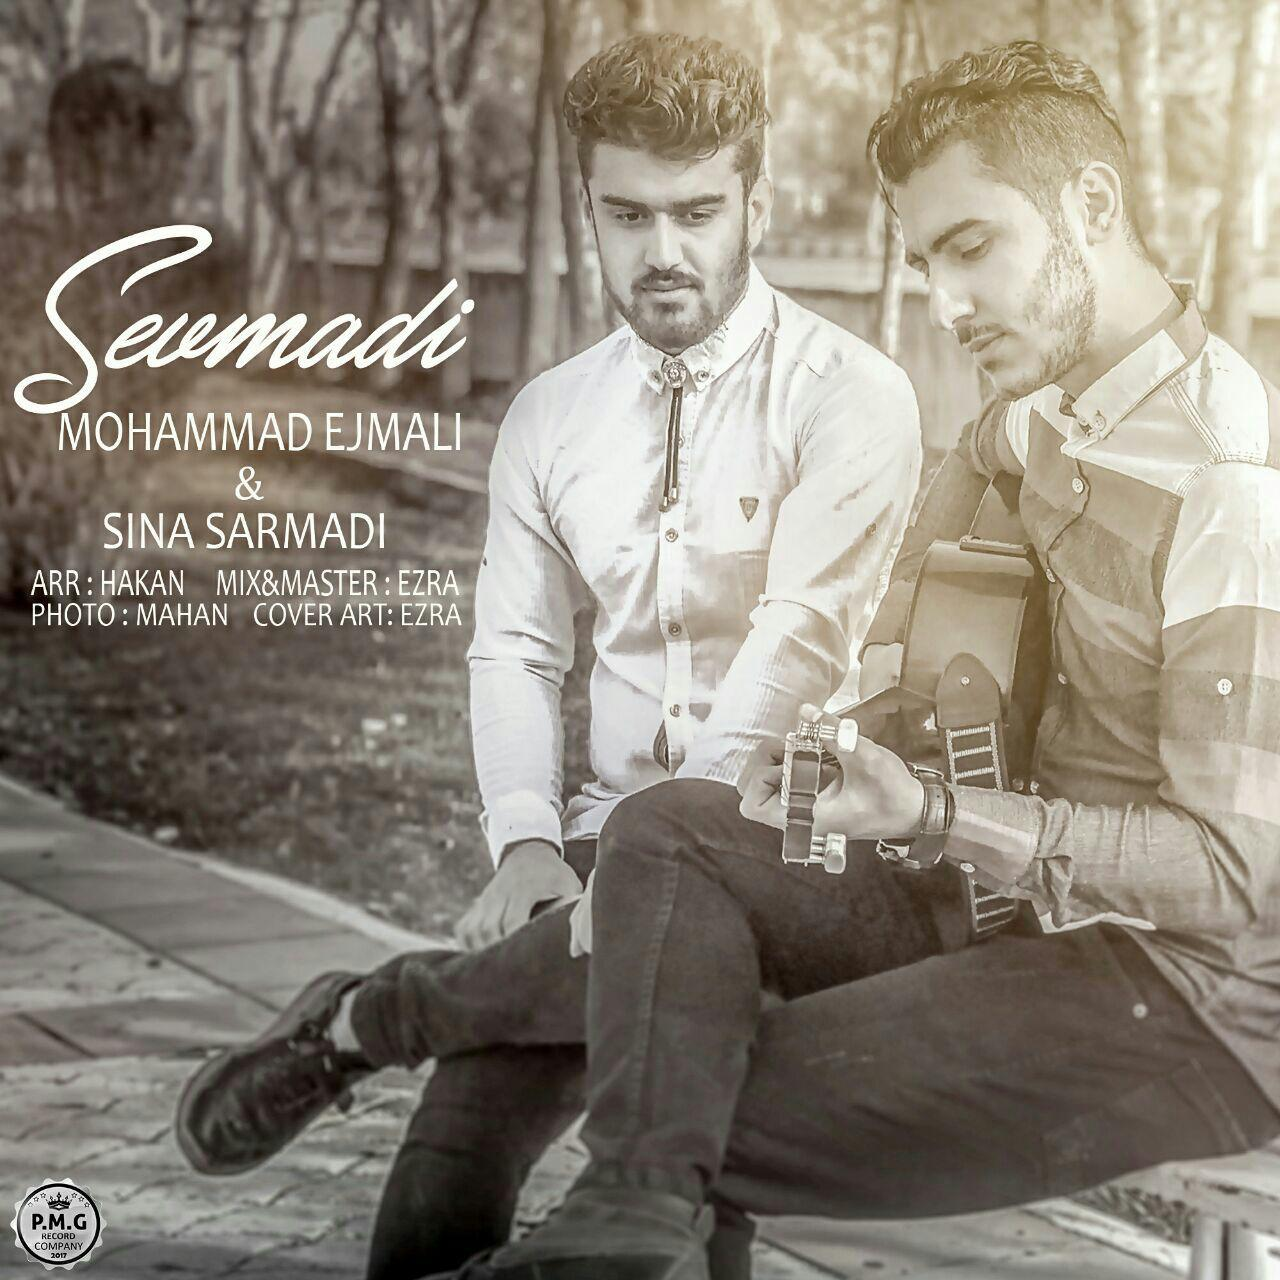 http://s8.picofile.com/file/8323623826/45Mohammad_Ejmali_Sina_Sarmadi_Sevmadi.jpg